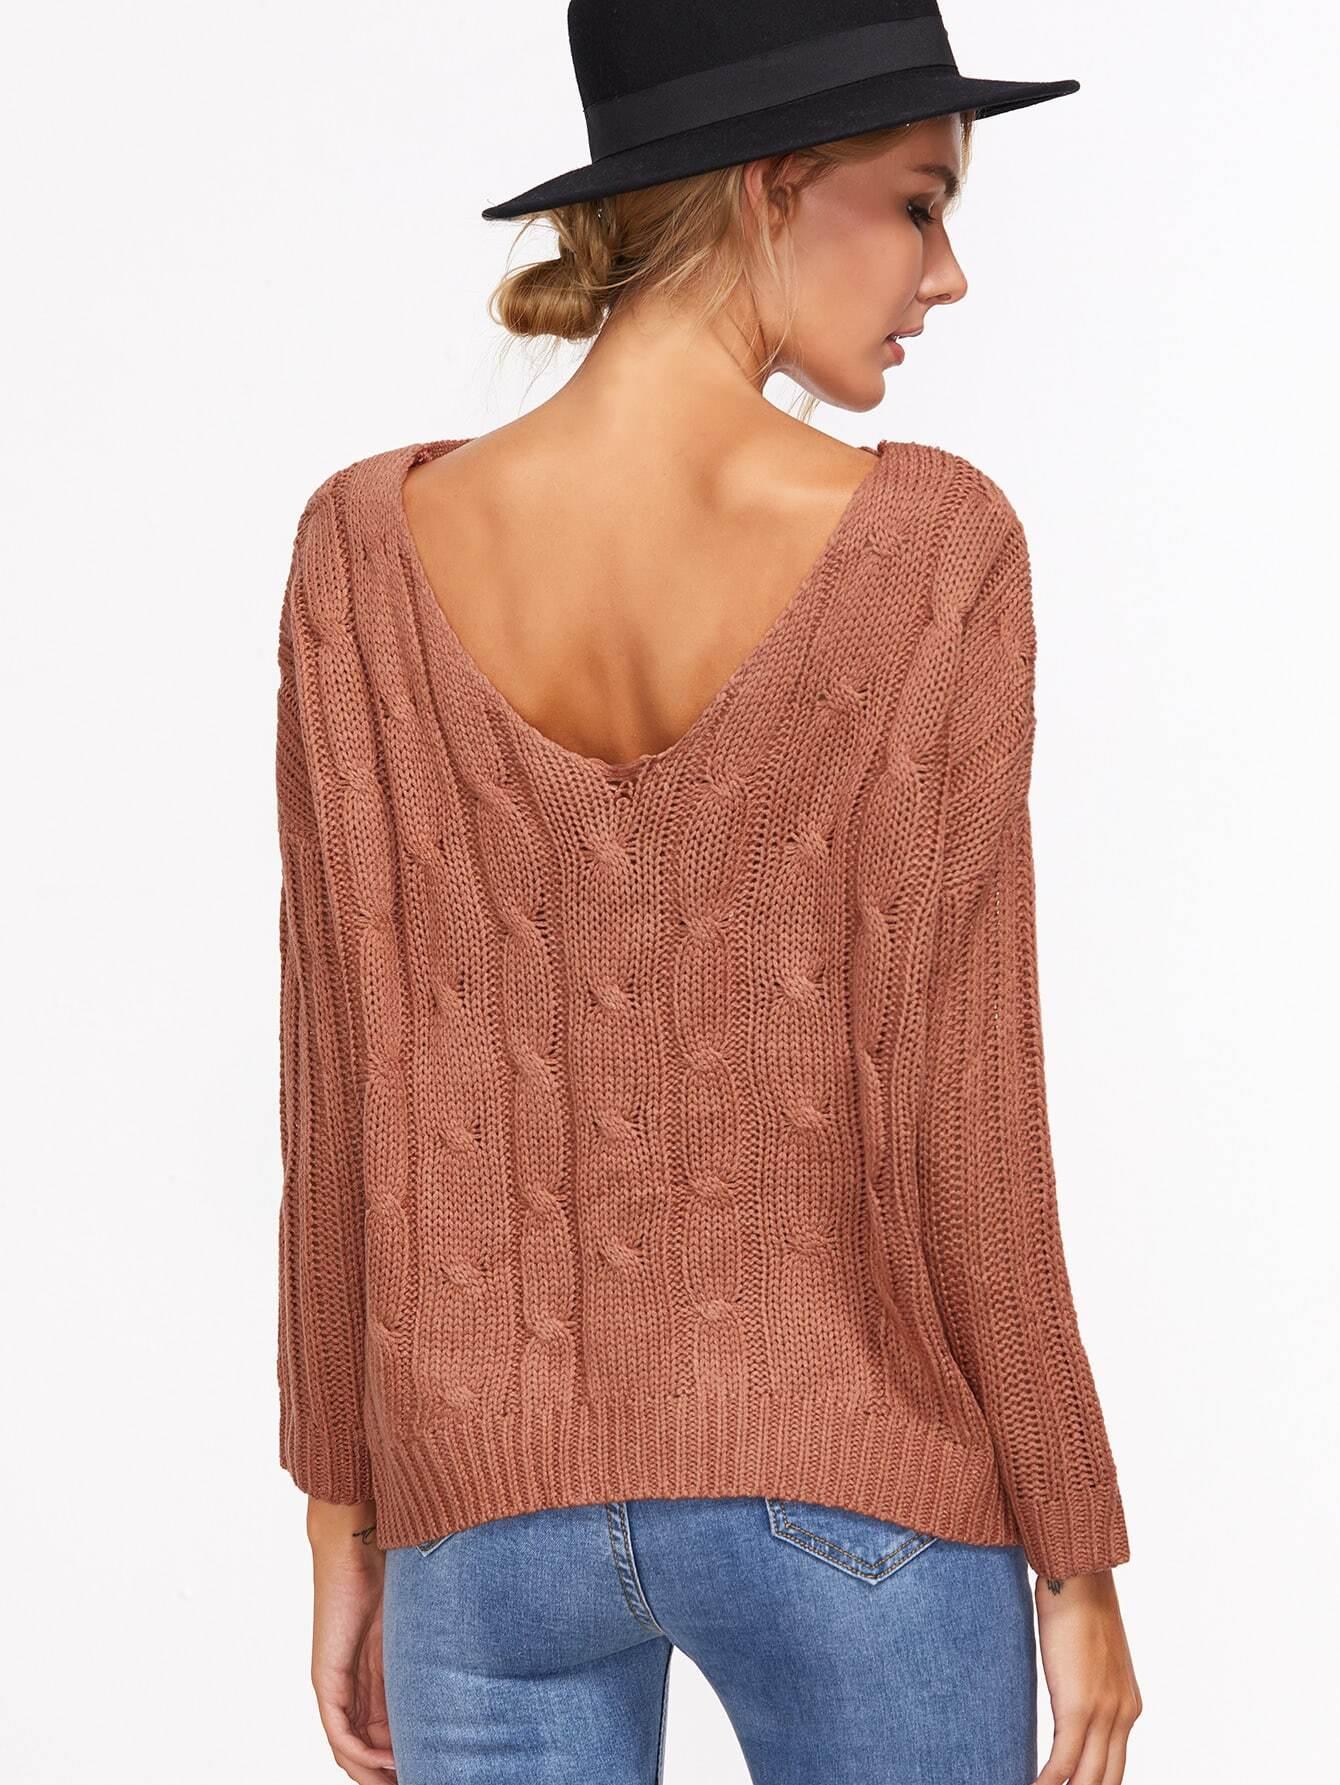 sweater161025101_2